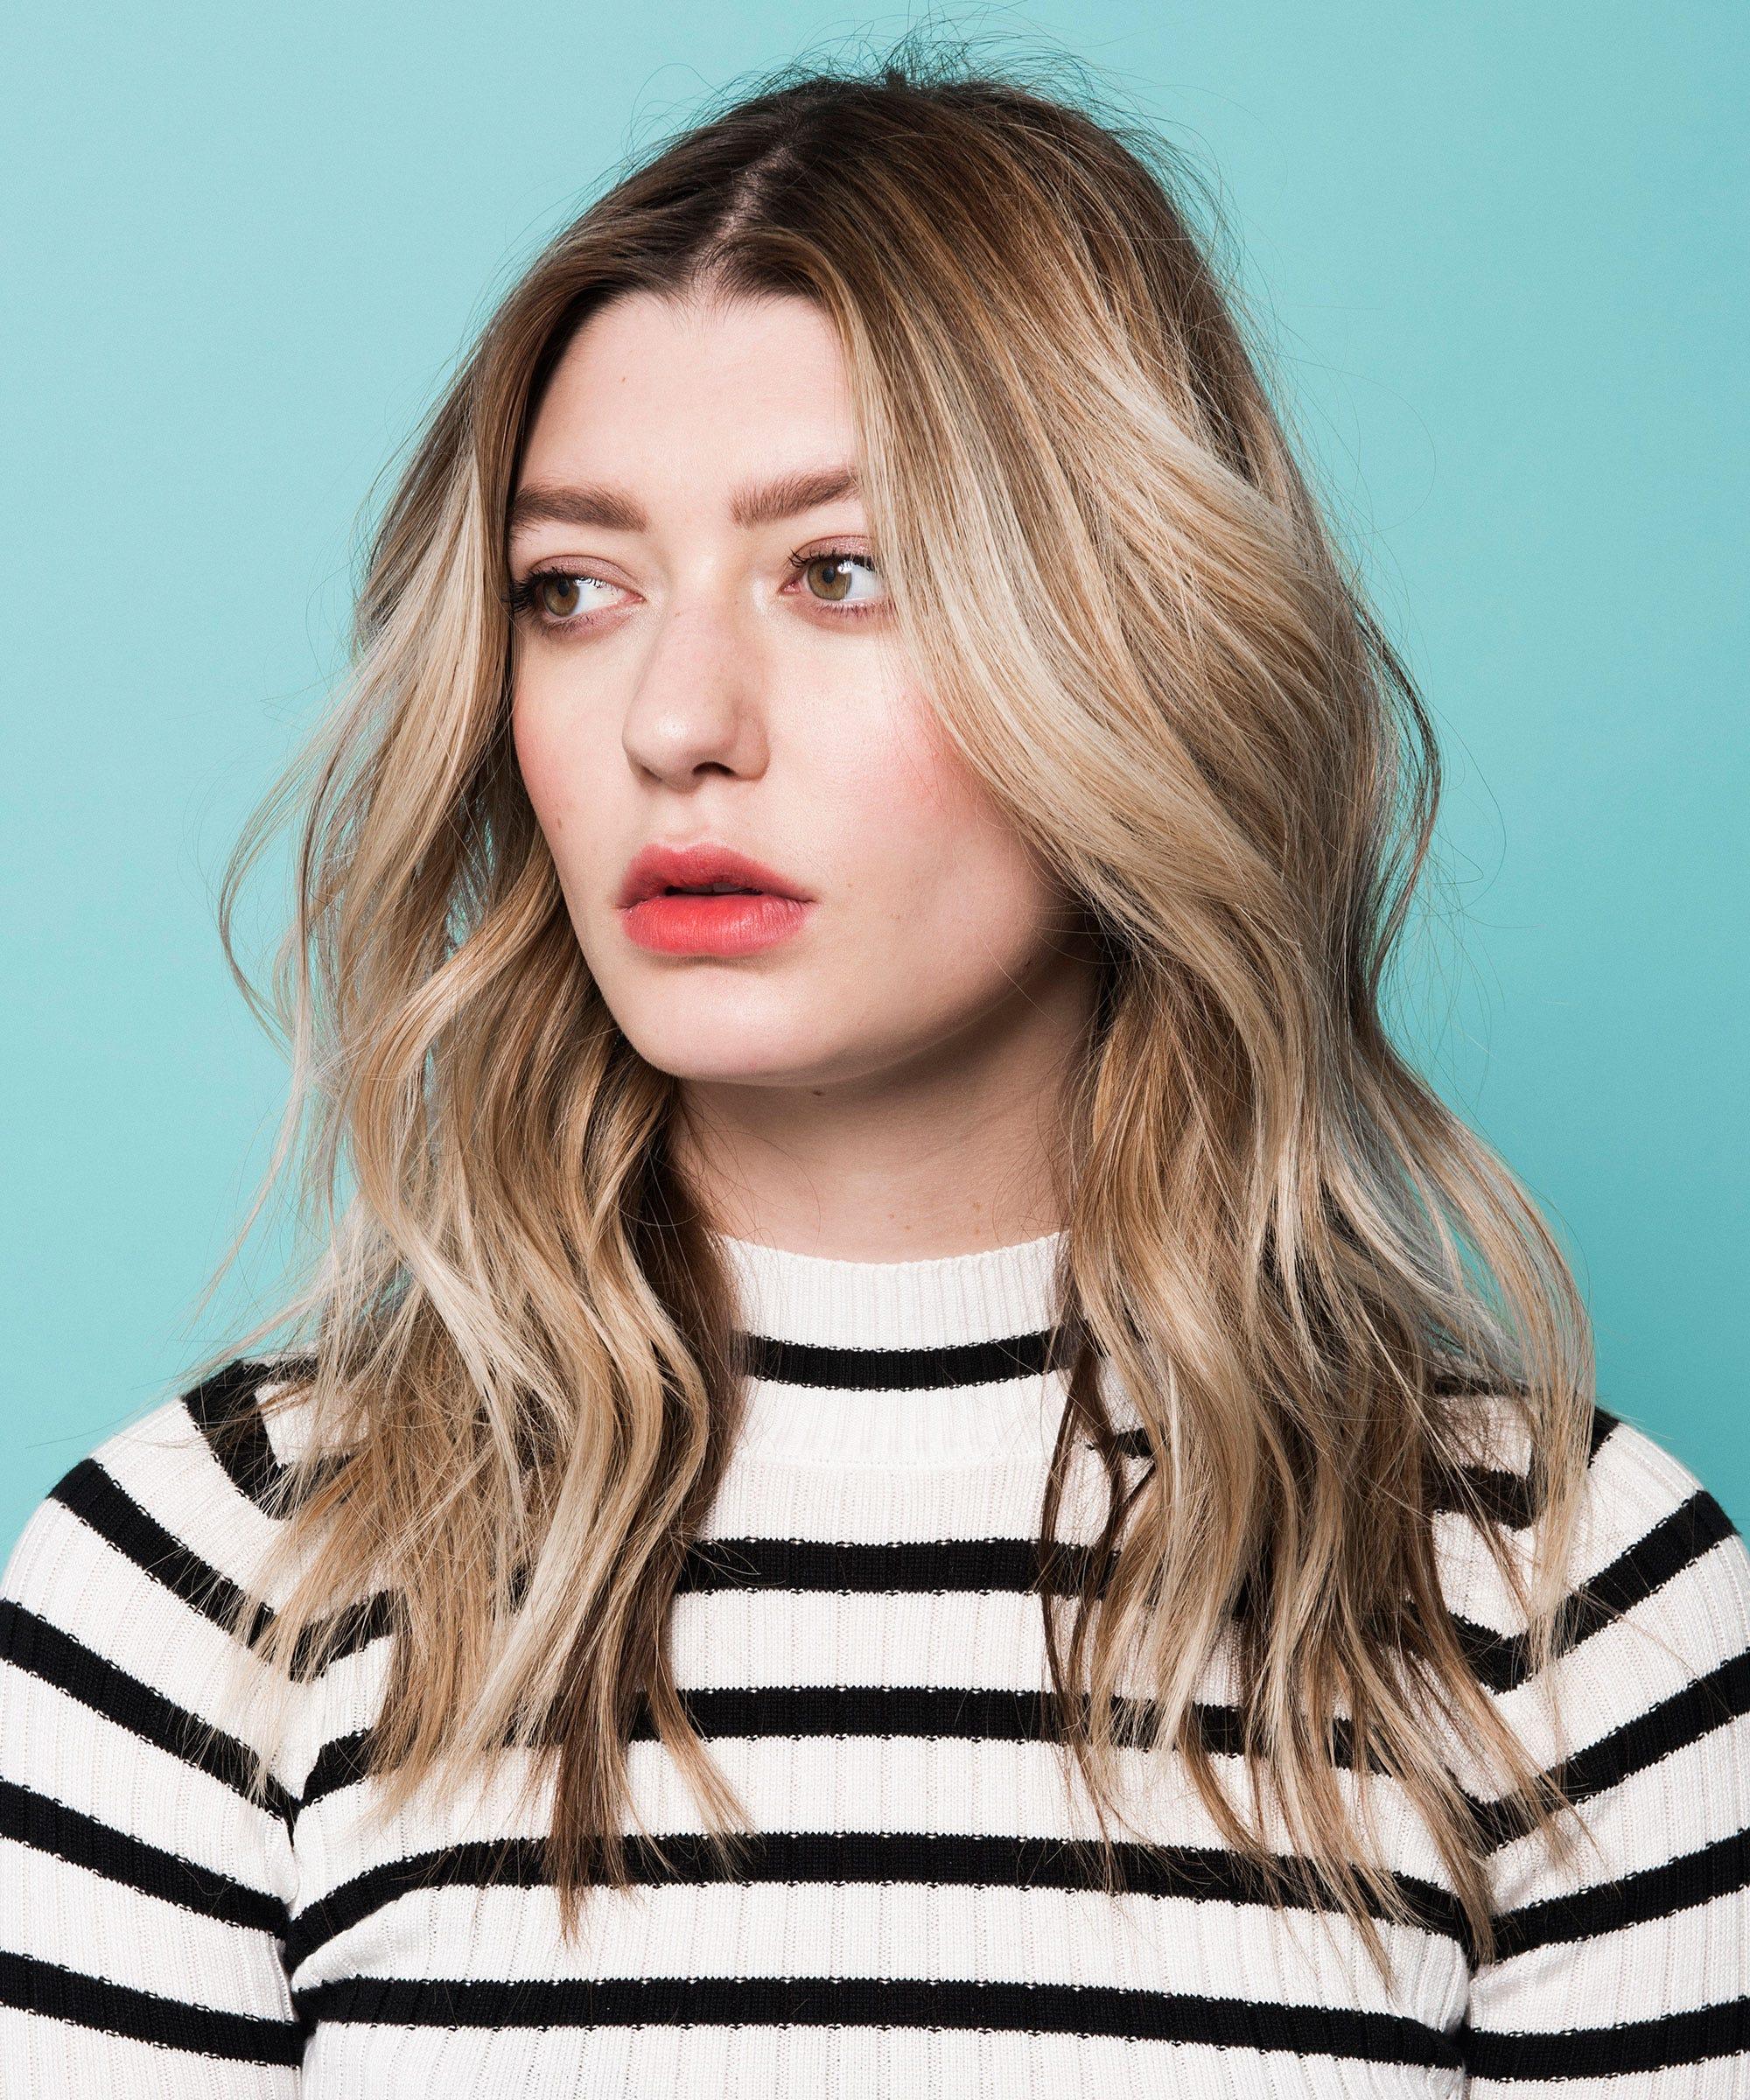 Riawna capri 901 wave salon hairstyle advice baditri Choice Image